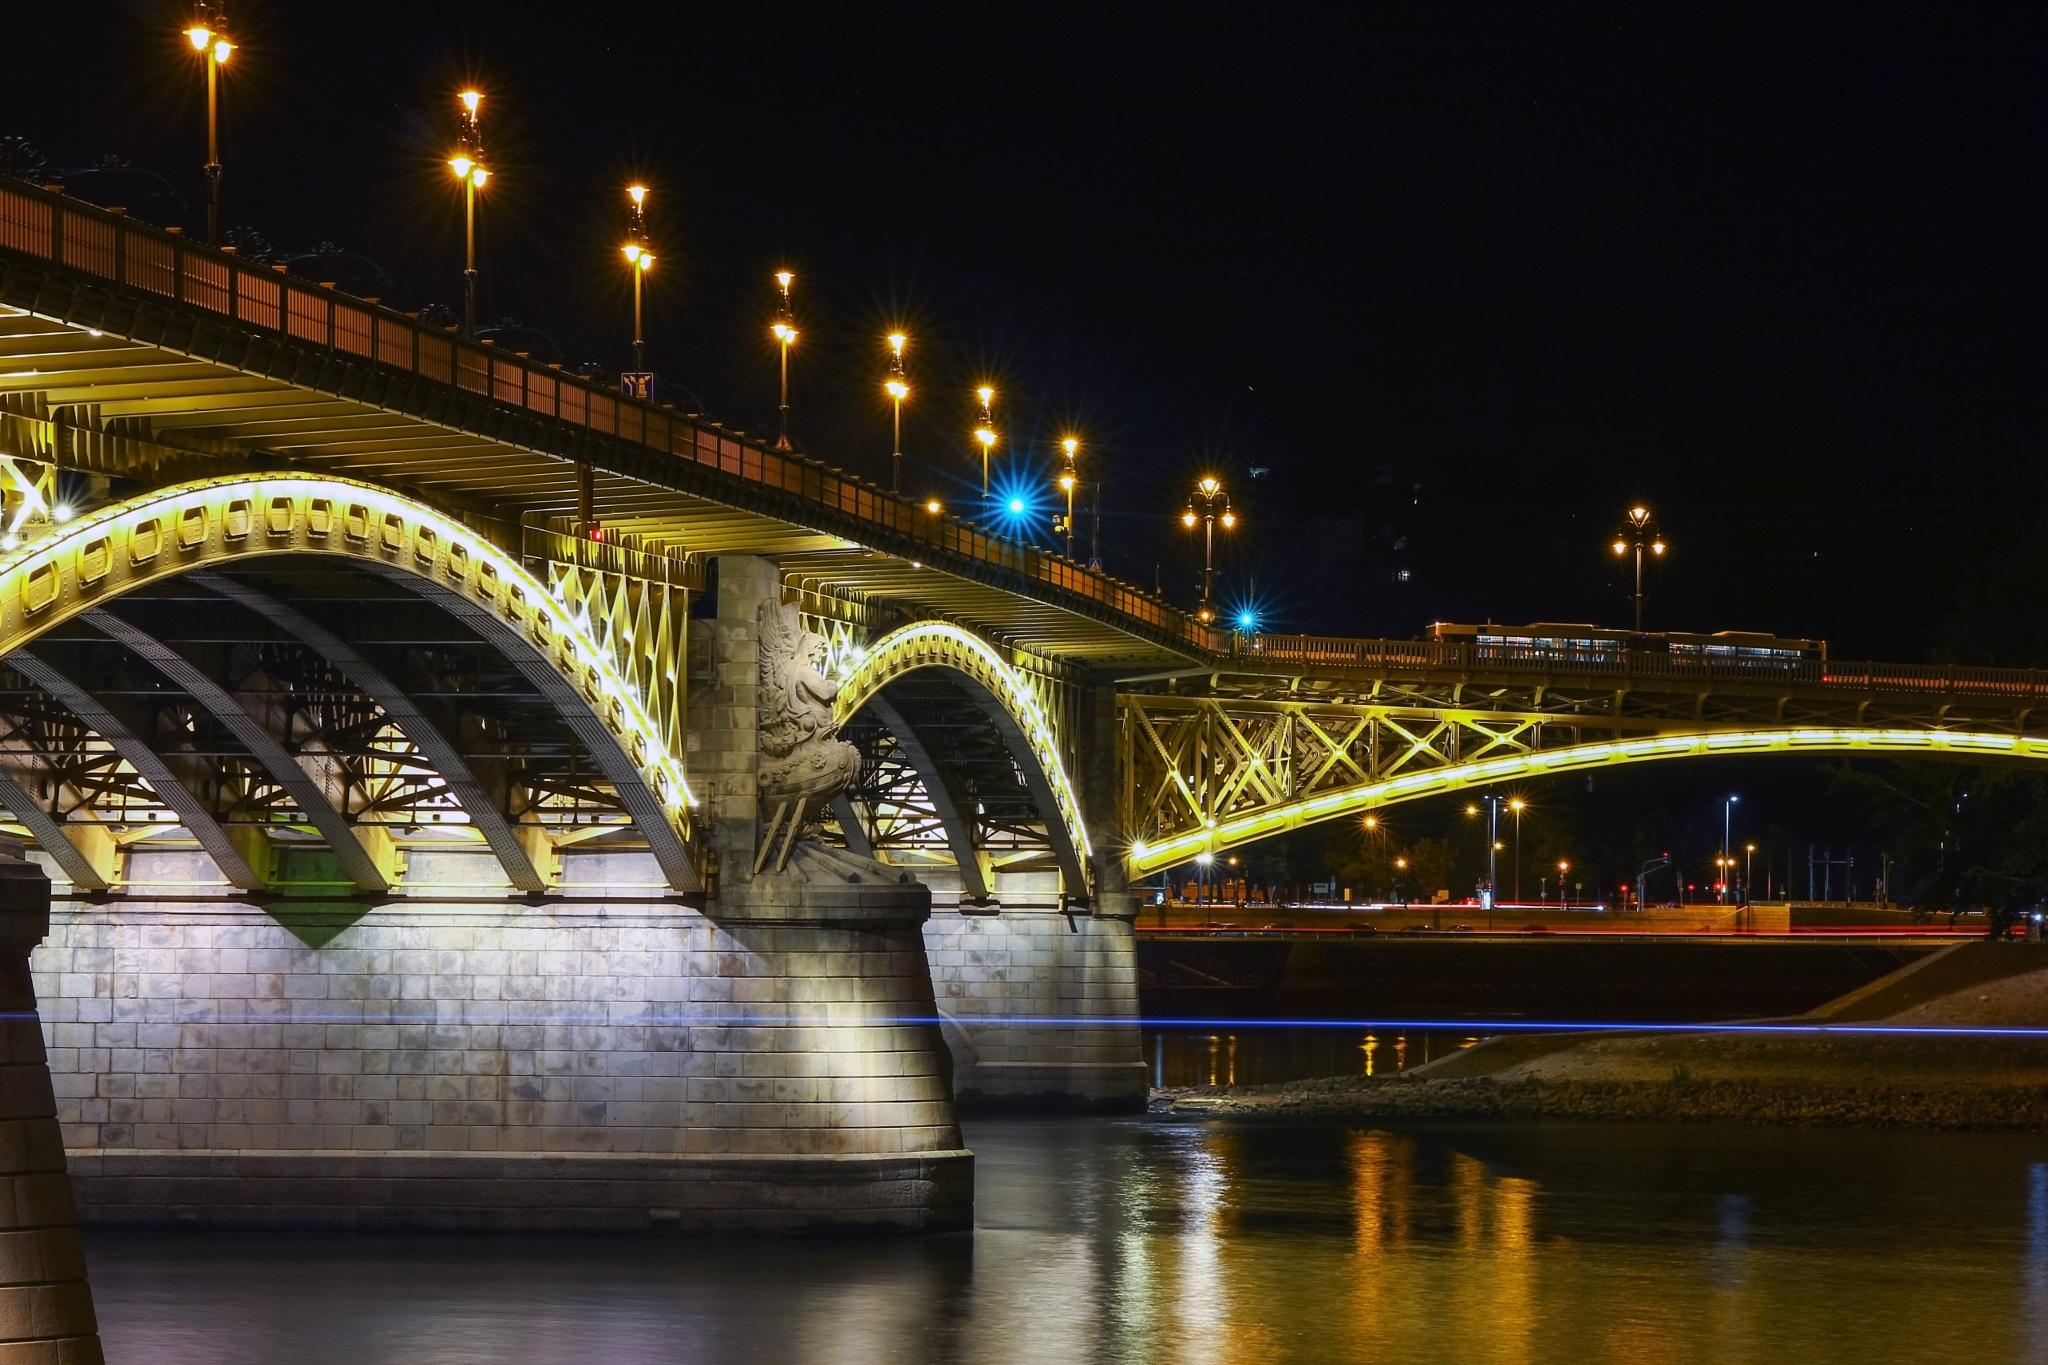 Margaret Bridge by Kovács Péter